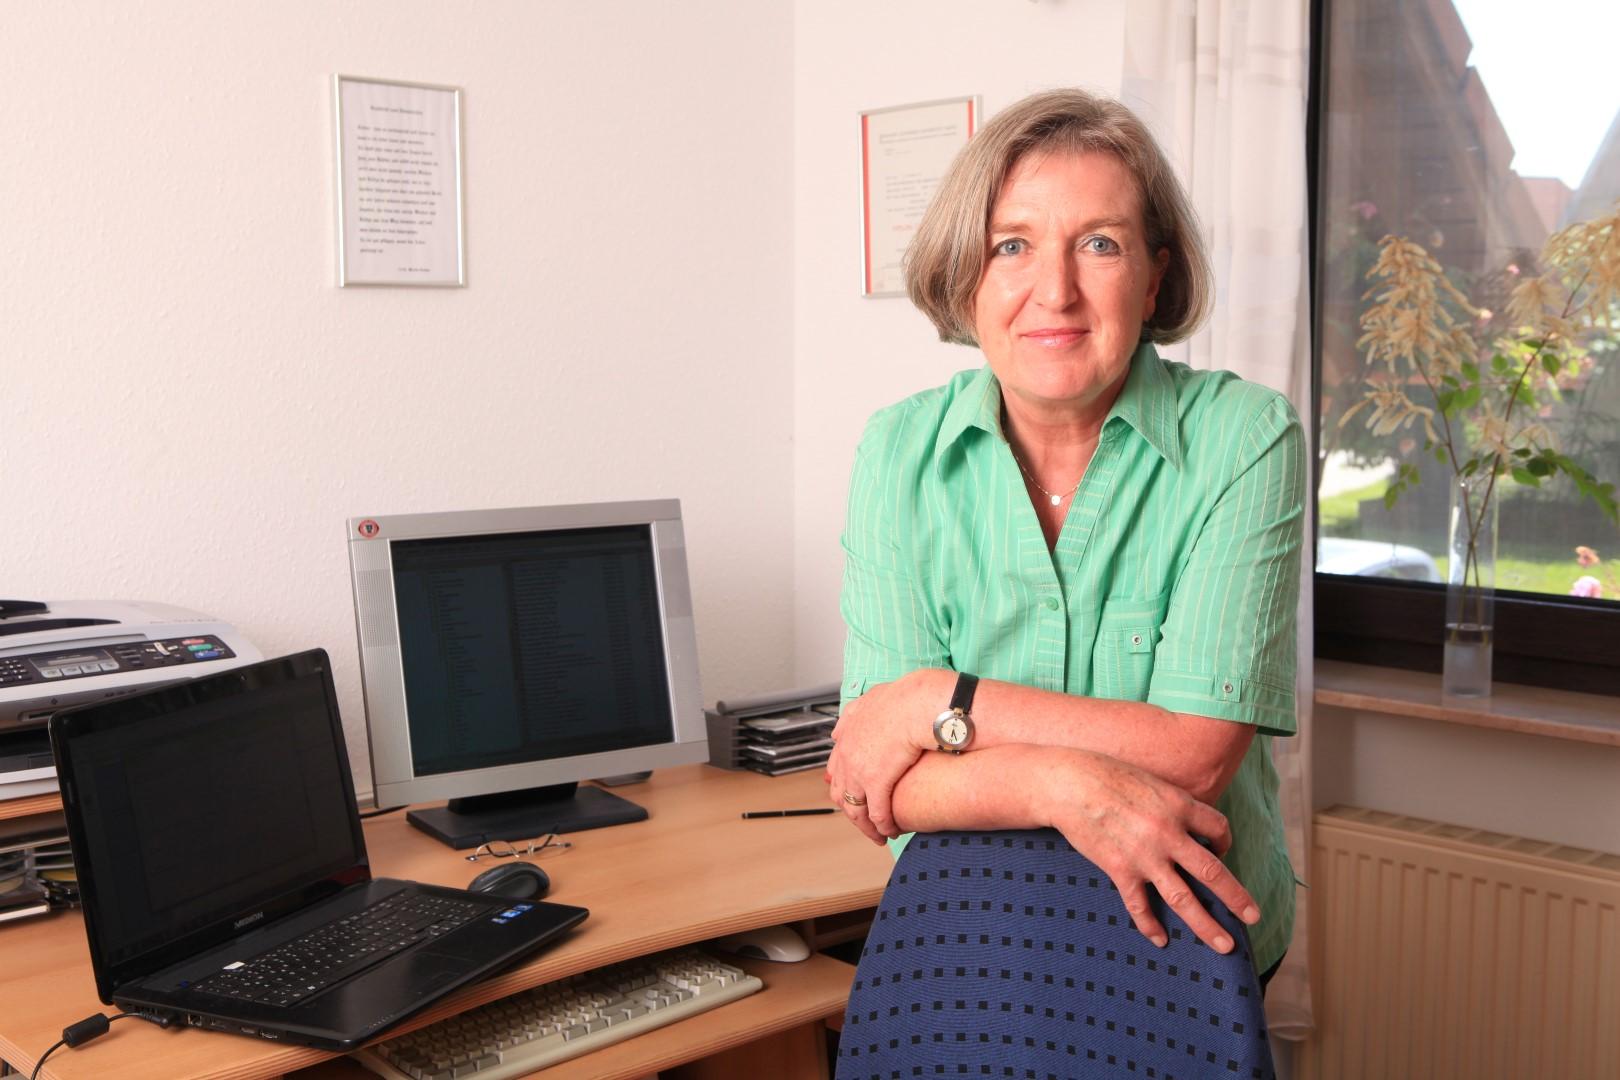 1-Gisela2014_029 Arbeitsplatz